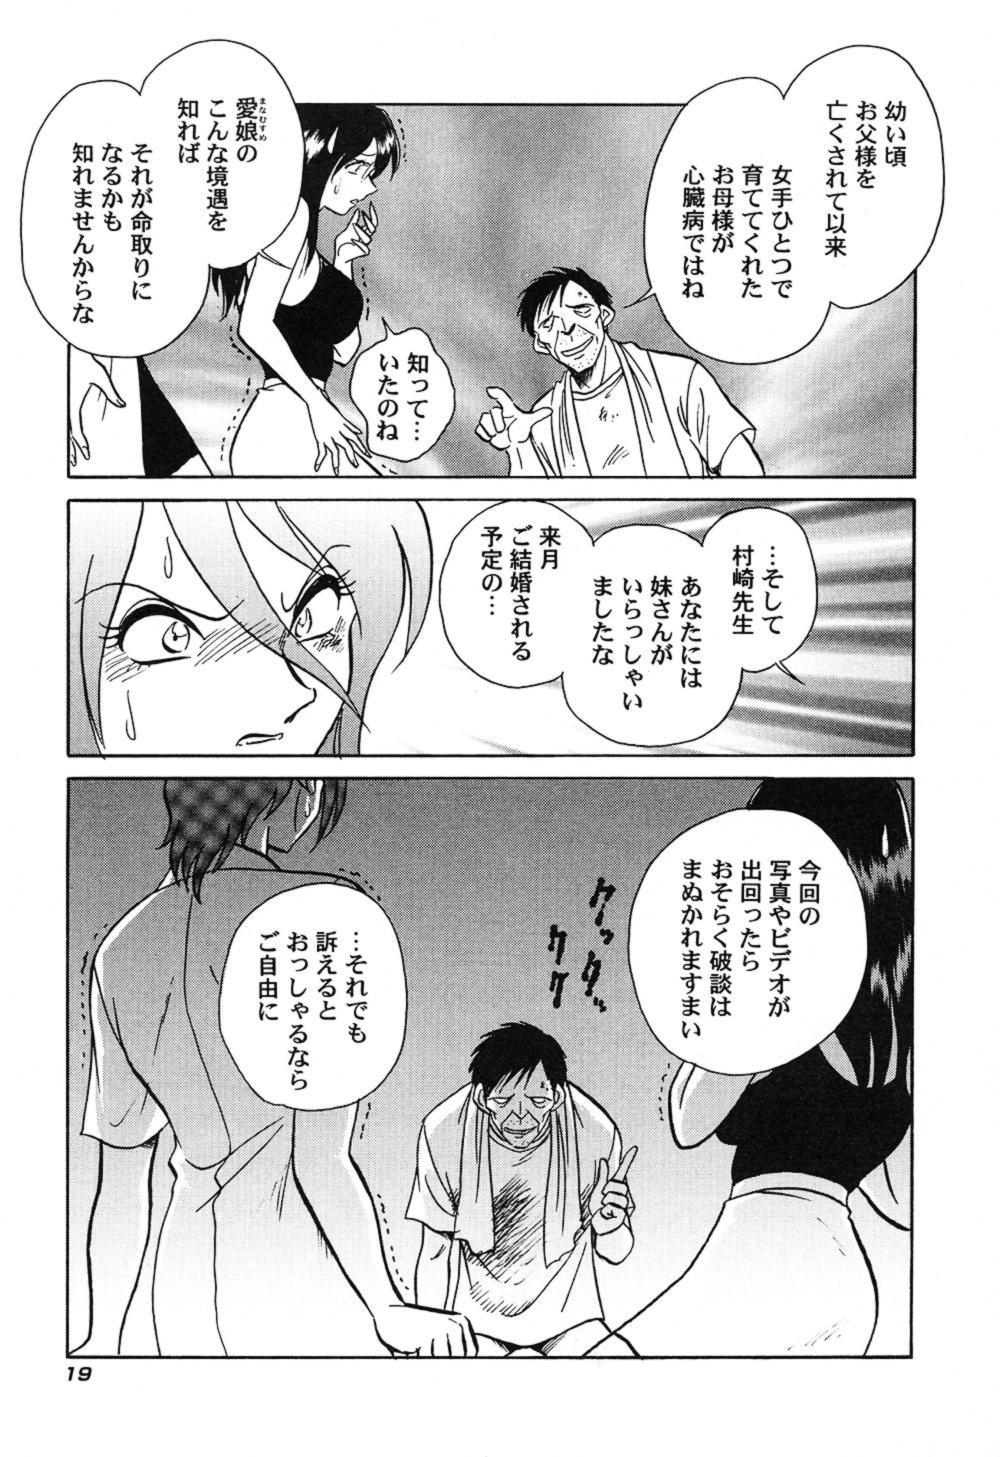 Hageshii Kagai Jugyou 21